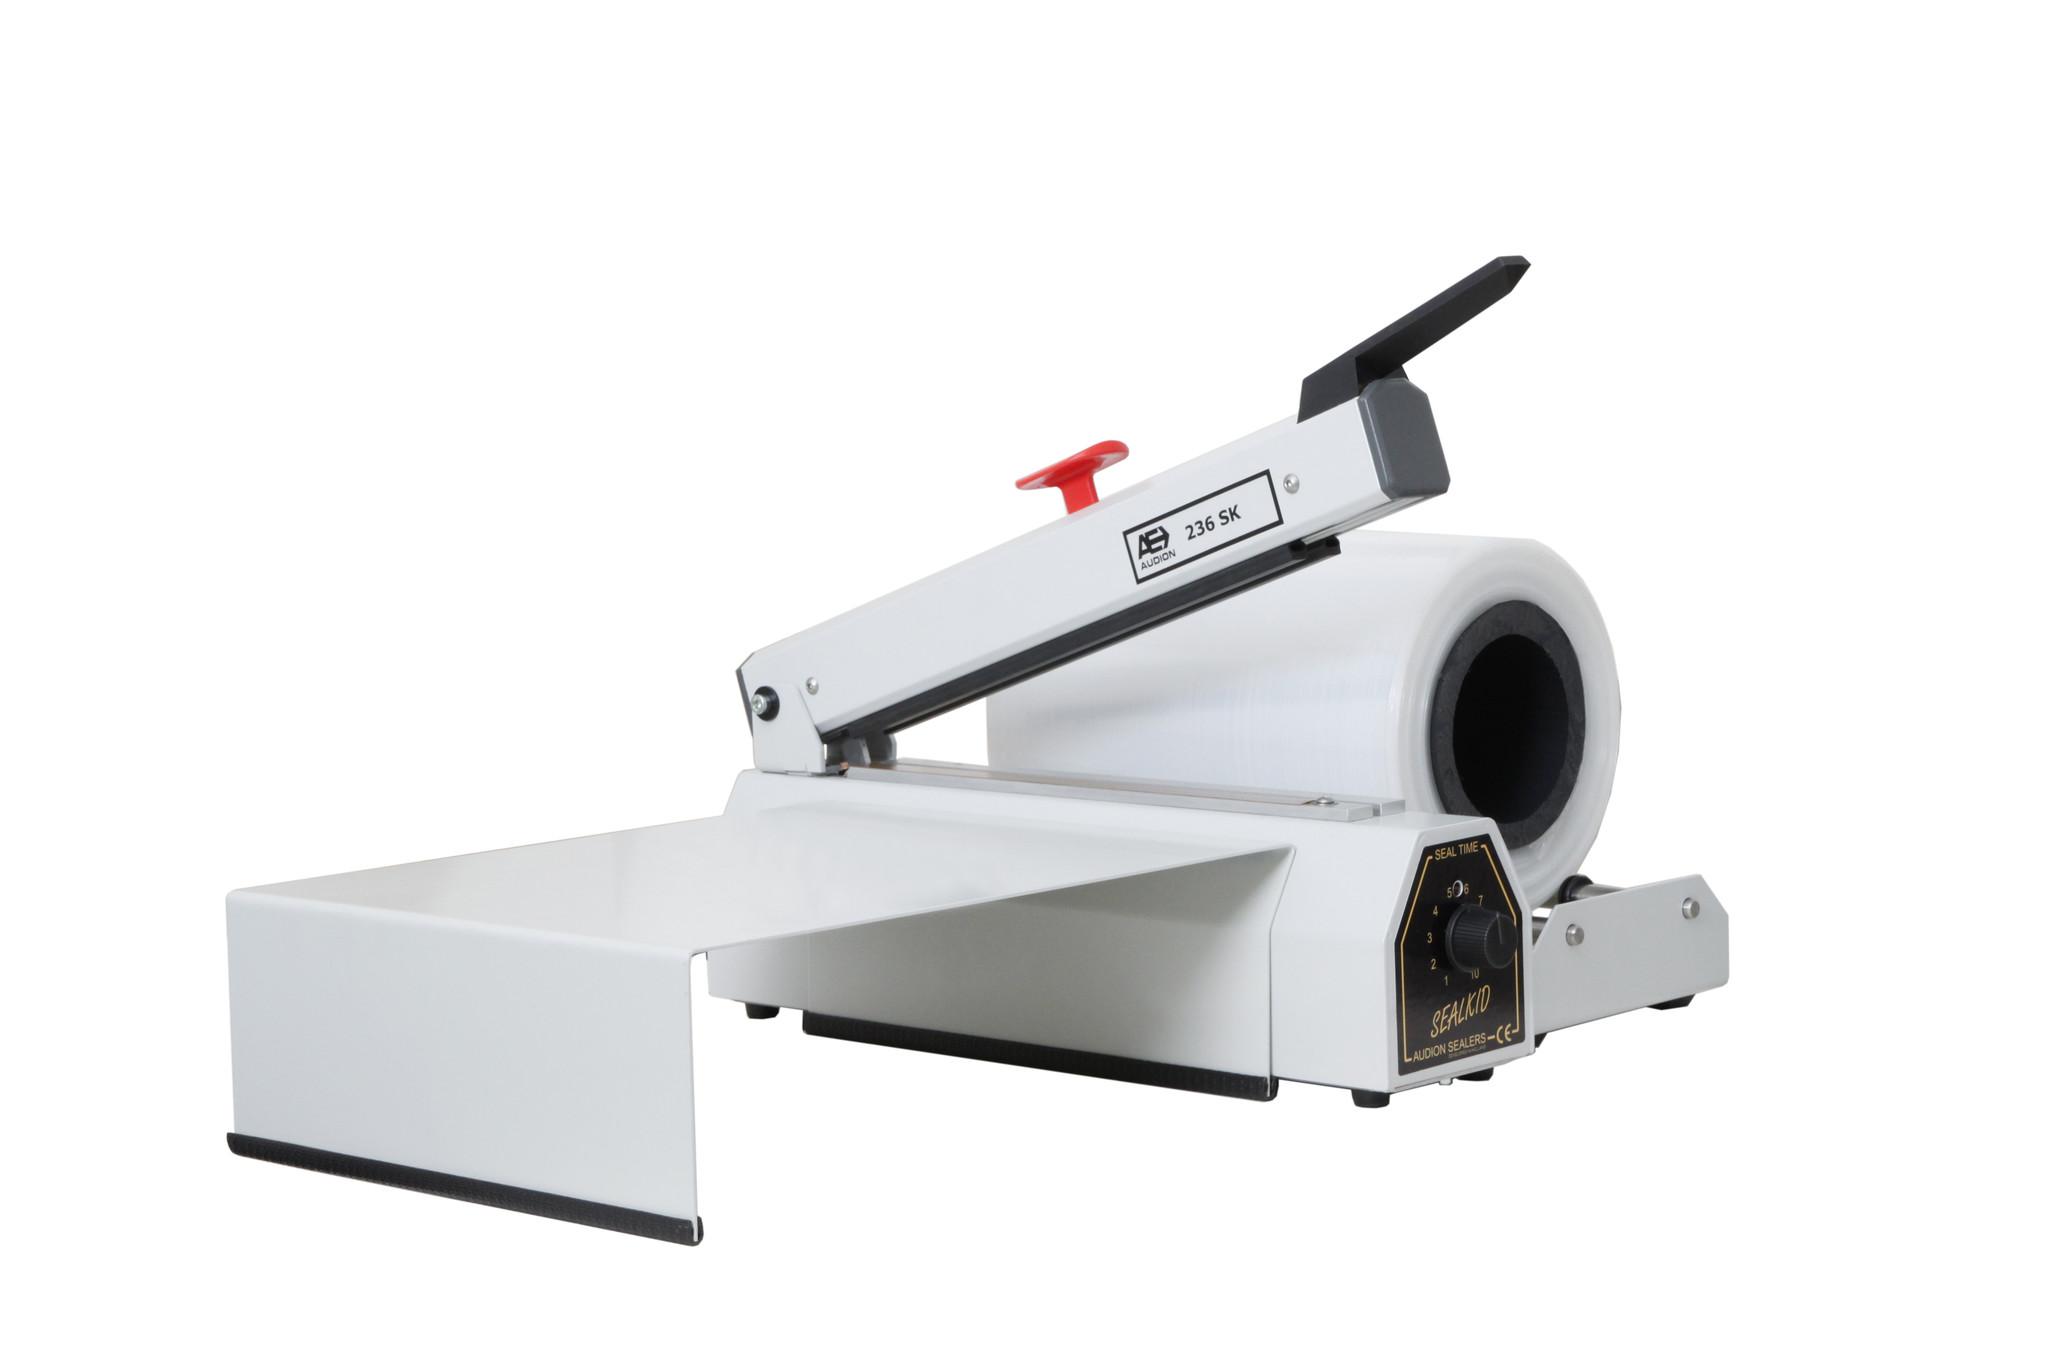 Audion Rolloflux (= folie-rolhouder), type RL 321 SK